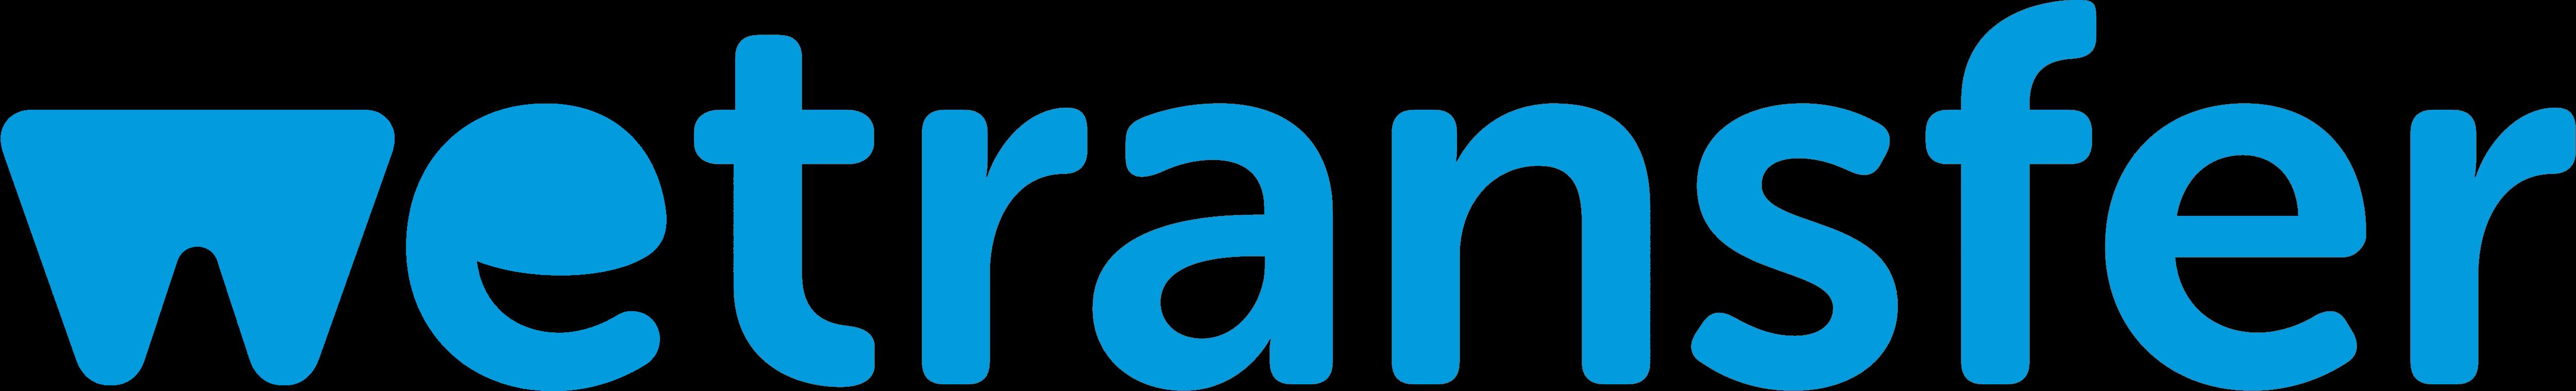 wetransfer_logo_logotype_we_transfer.png